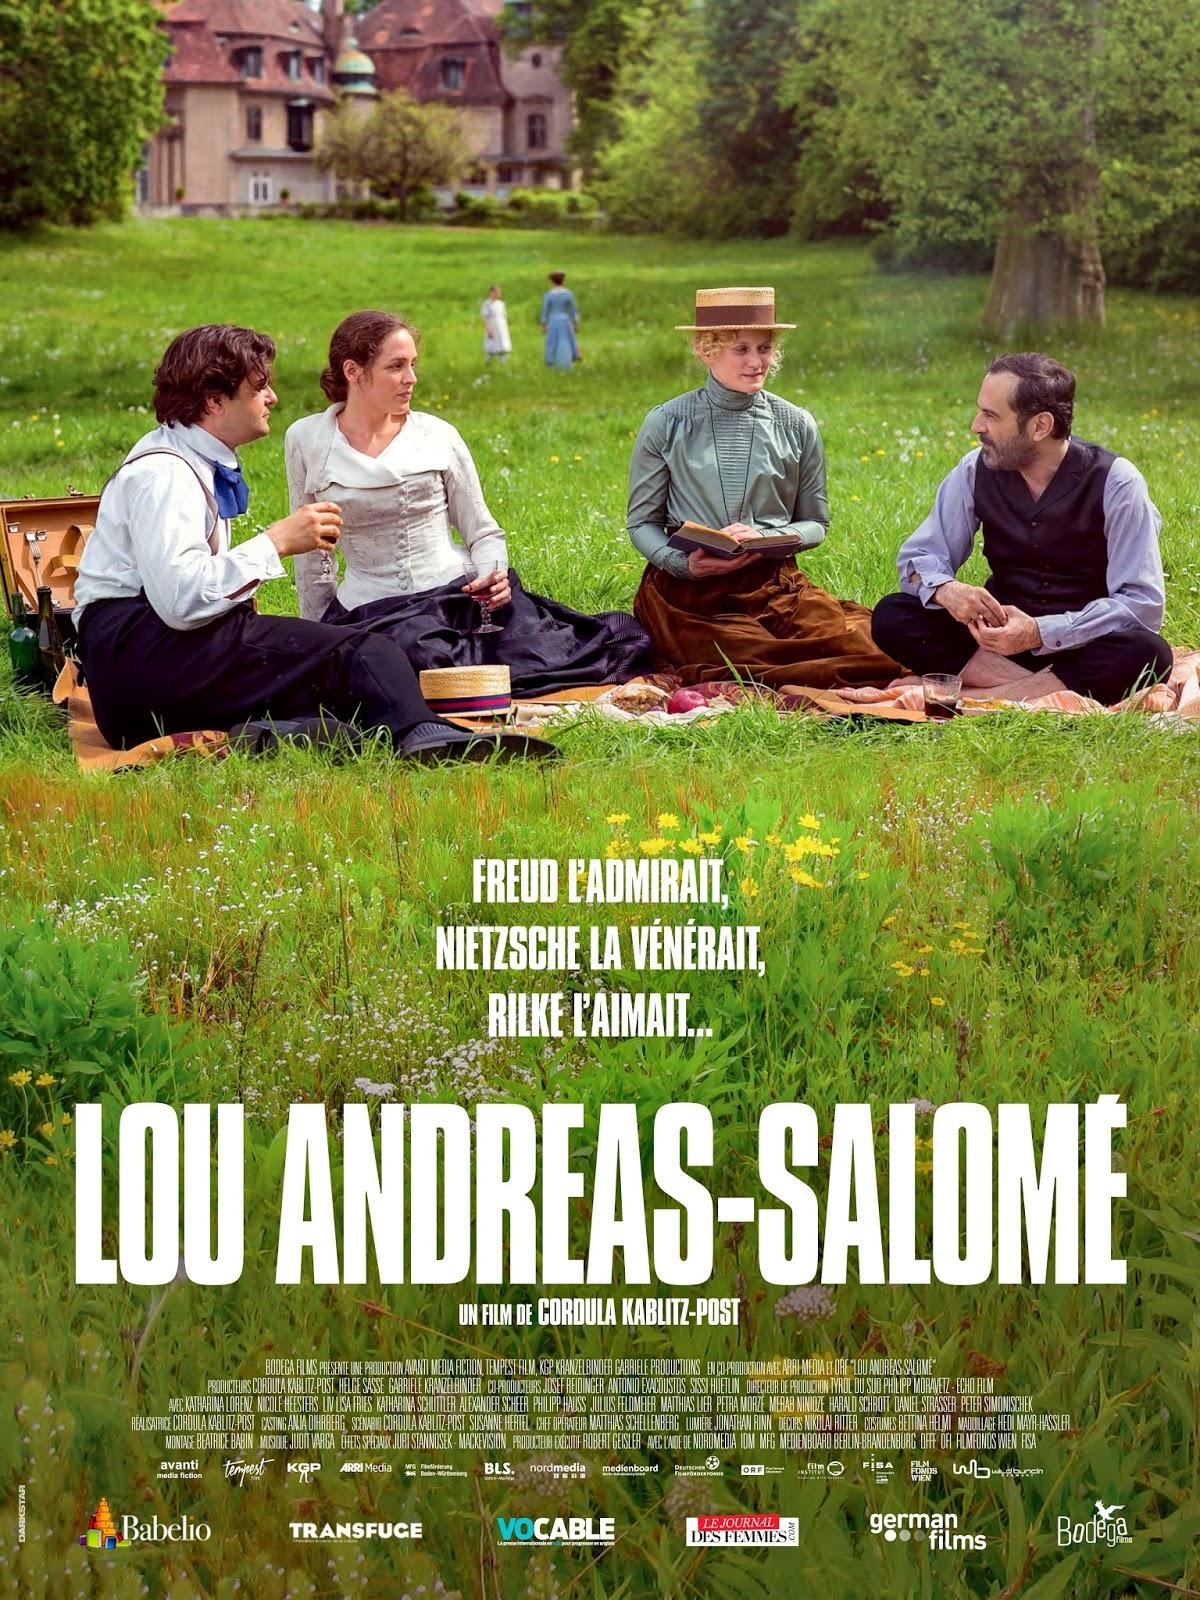 CARTELES DEL CINEMA: LOU ANDREAS-SALOMÉ - Lou Andreas-Salomé - 2016